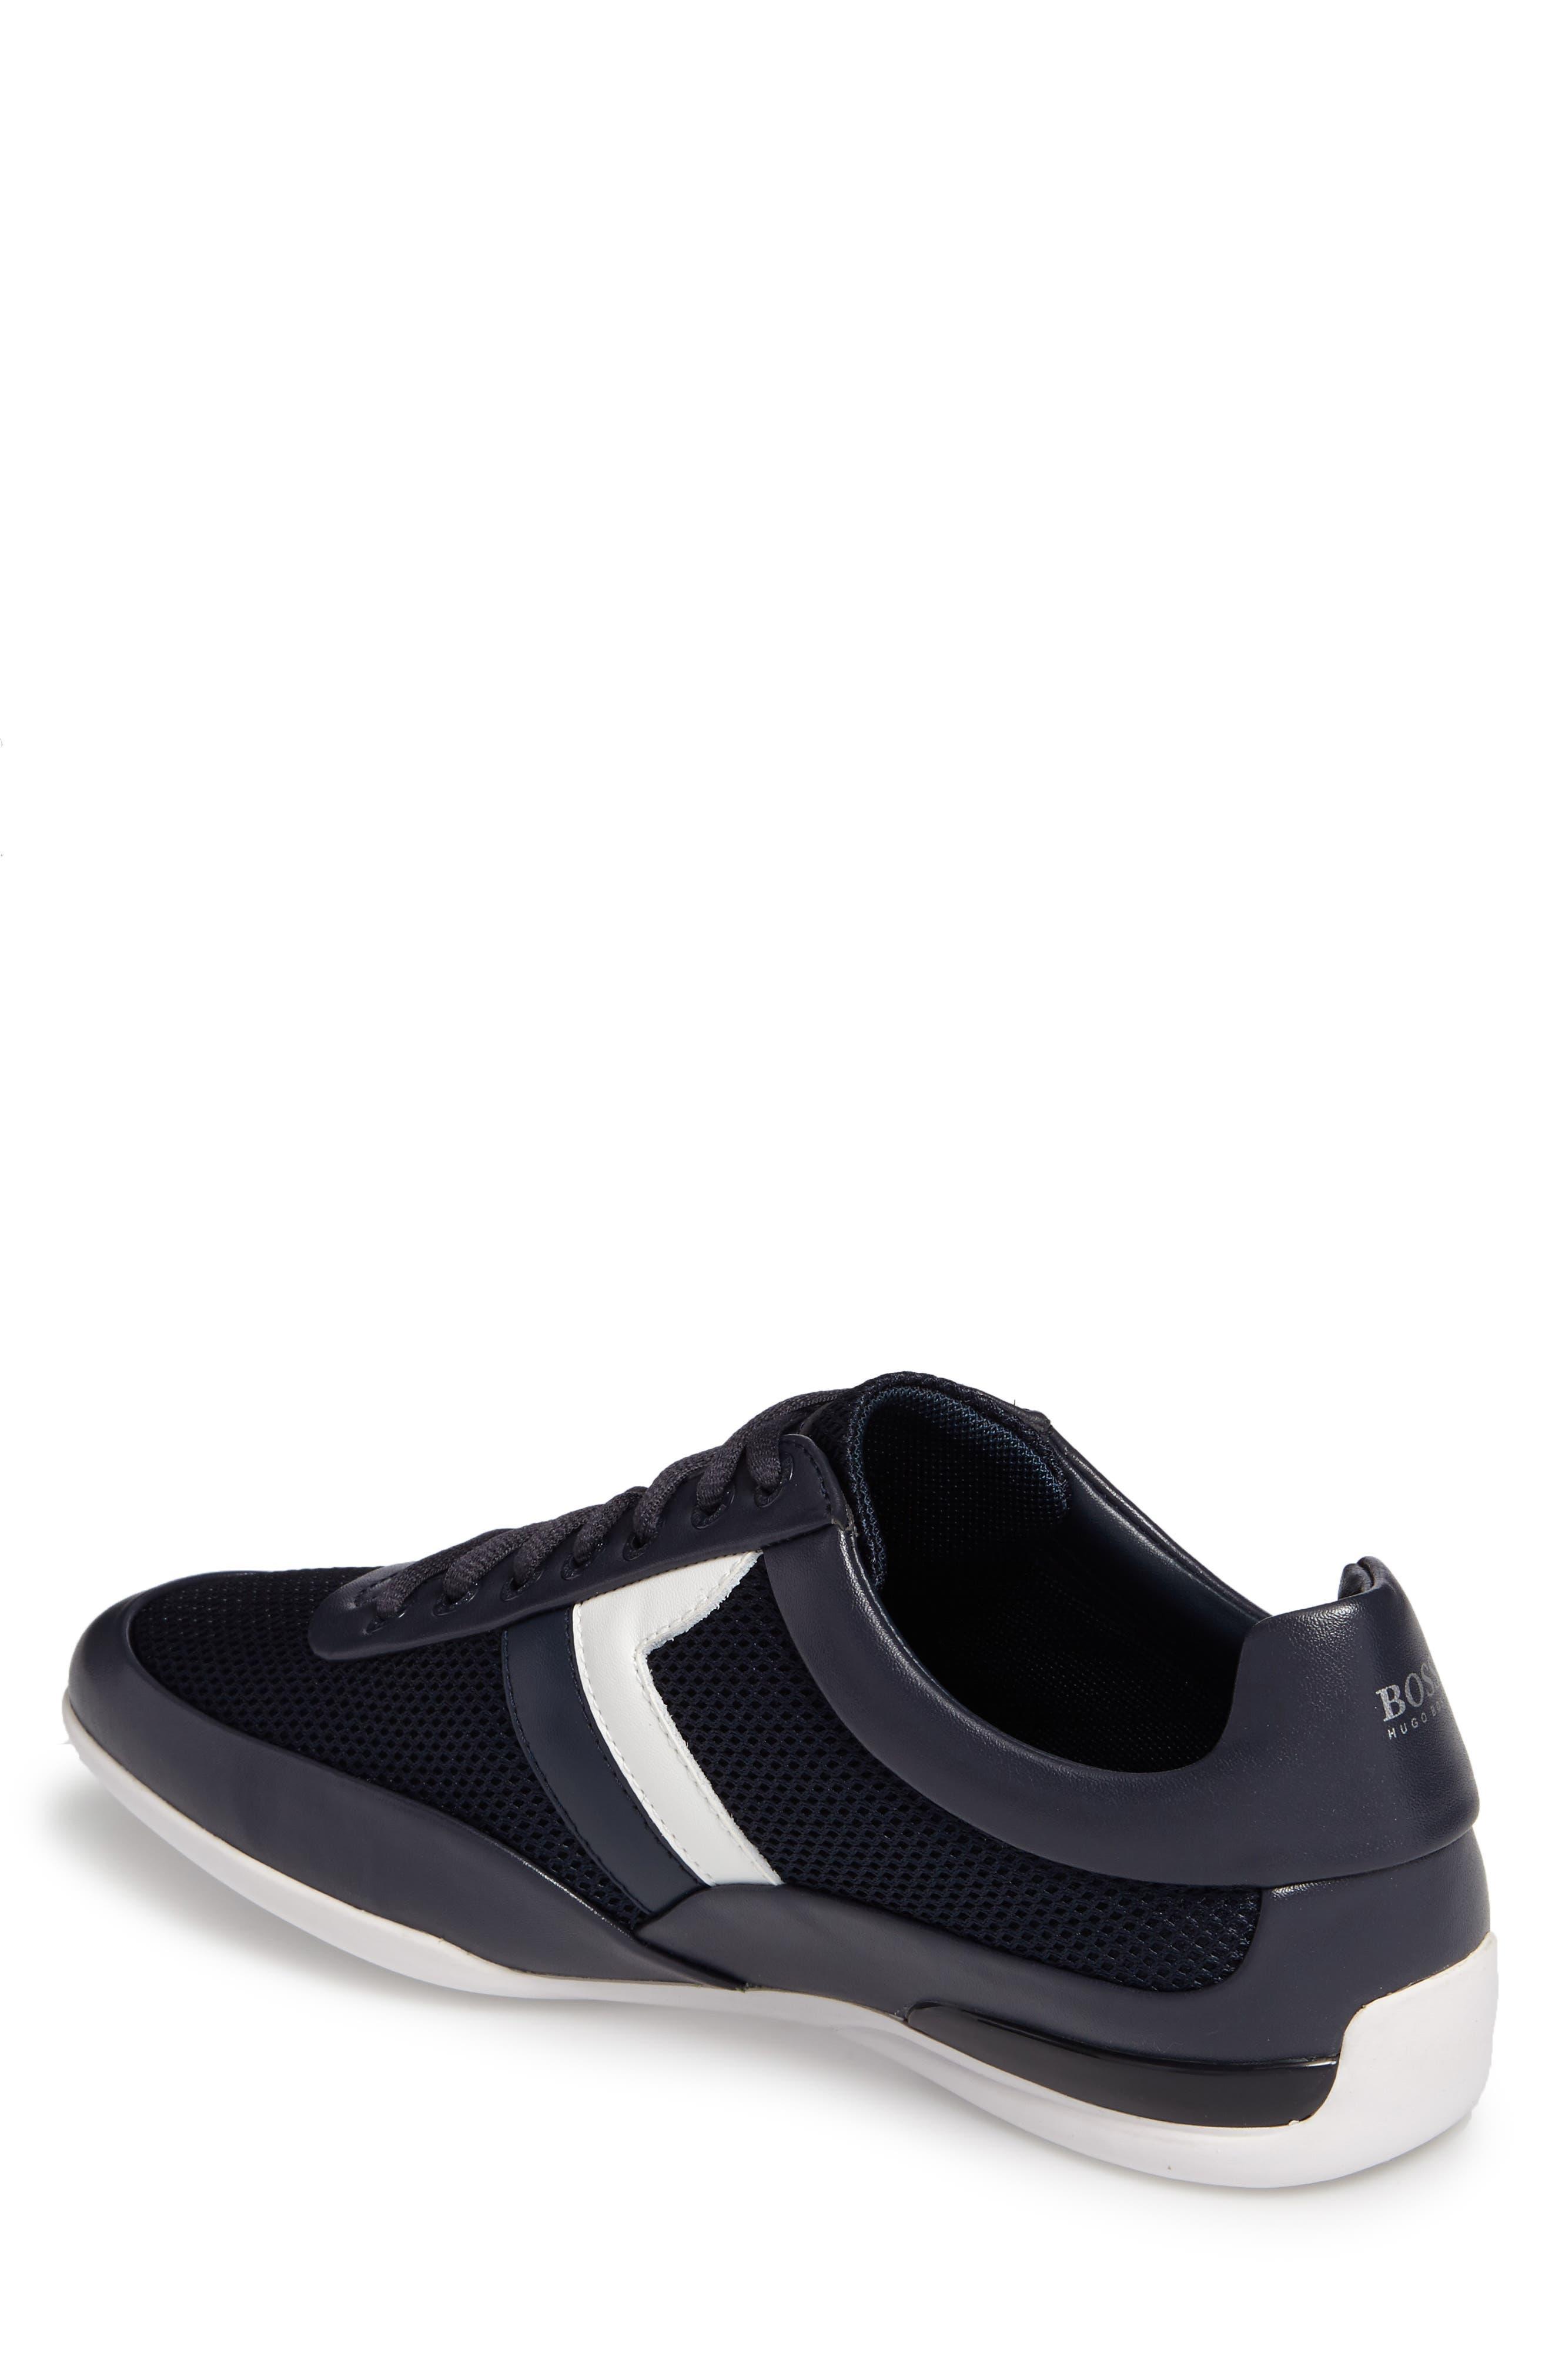 Green Space Mesh Sneaker,                             Alternate thumbnail 2, color,                             405